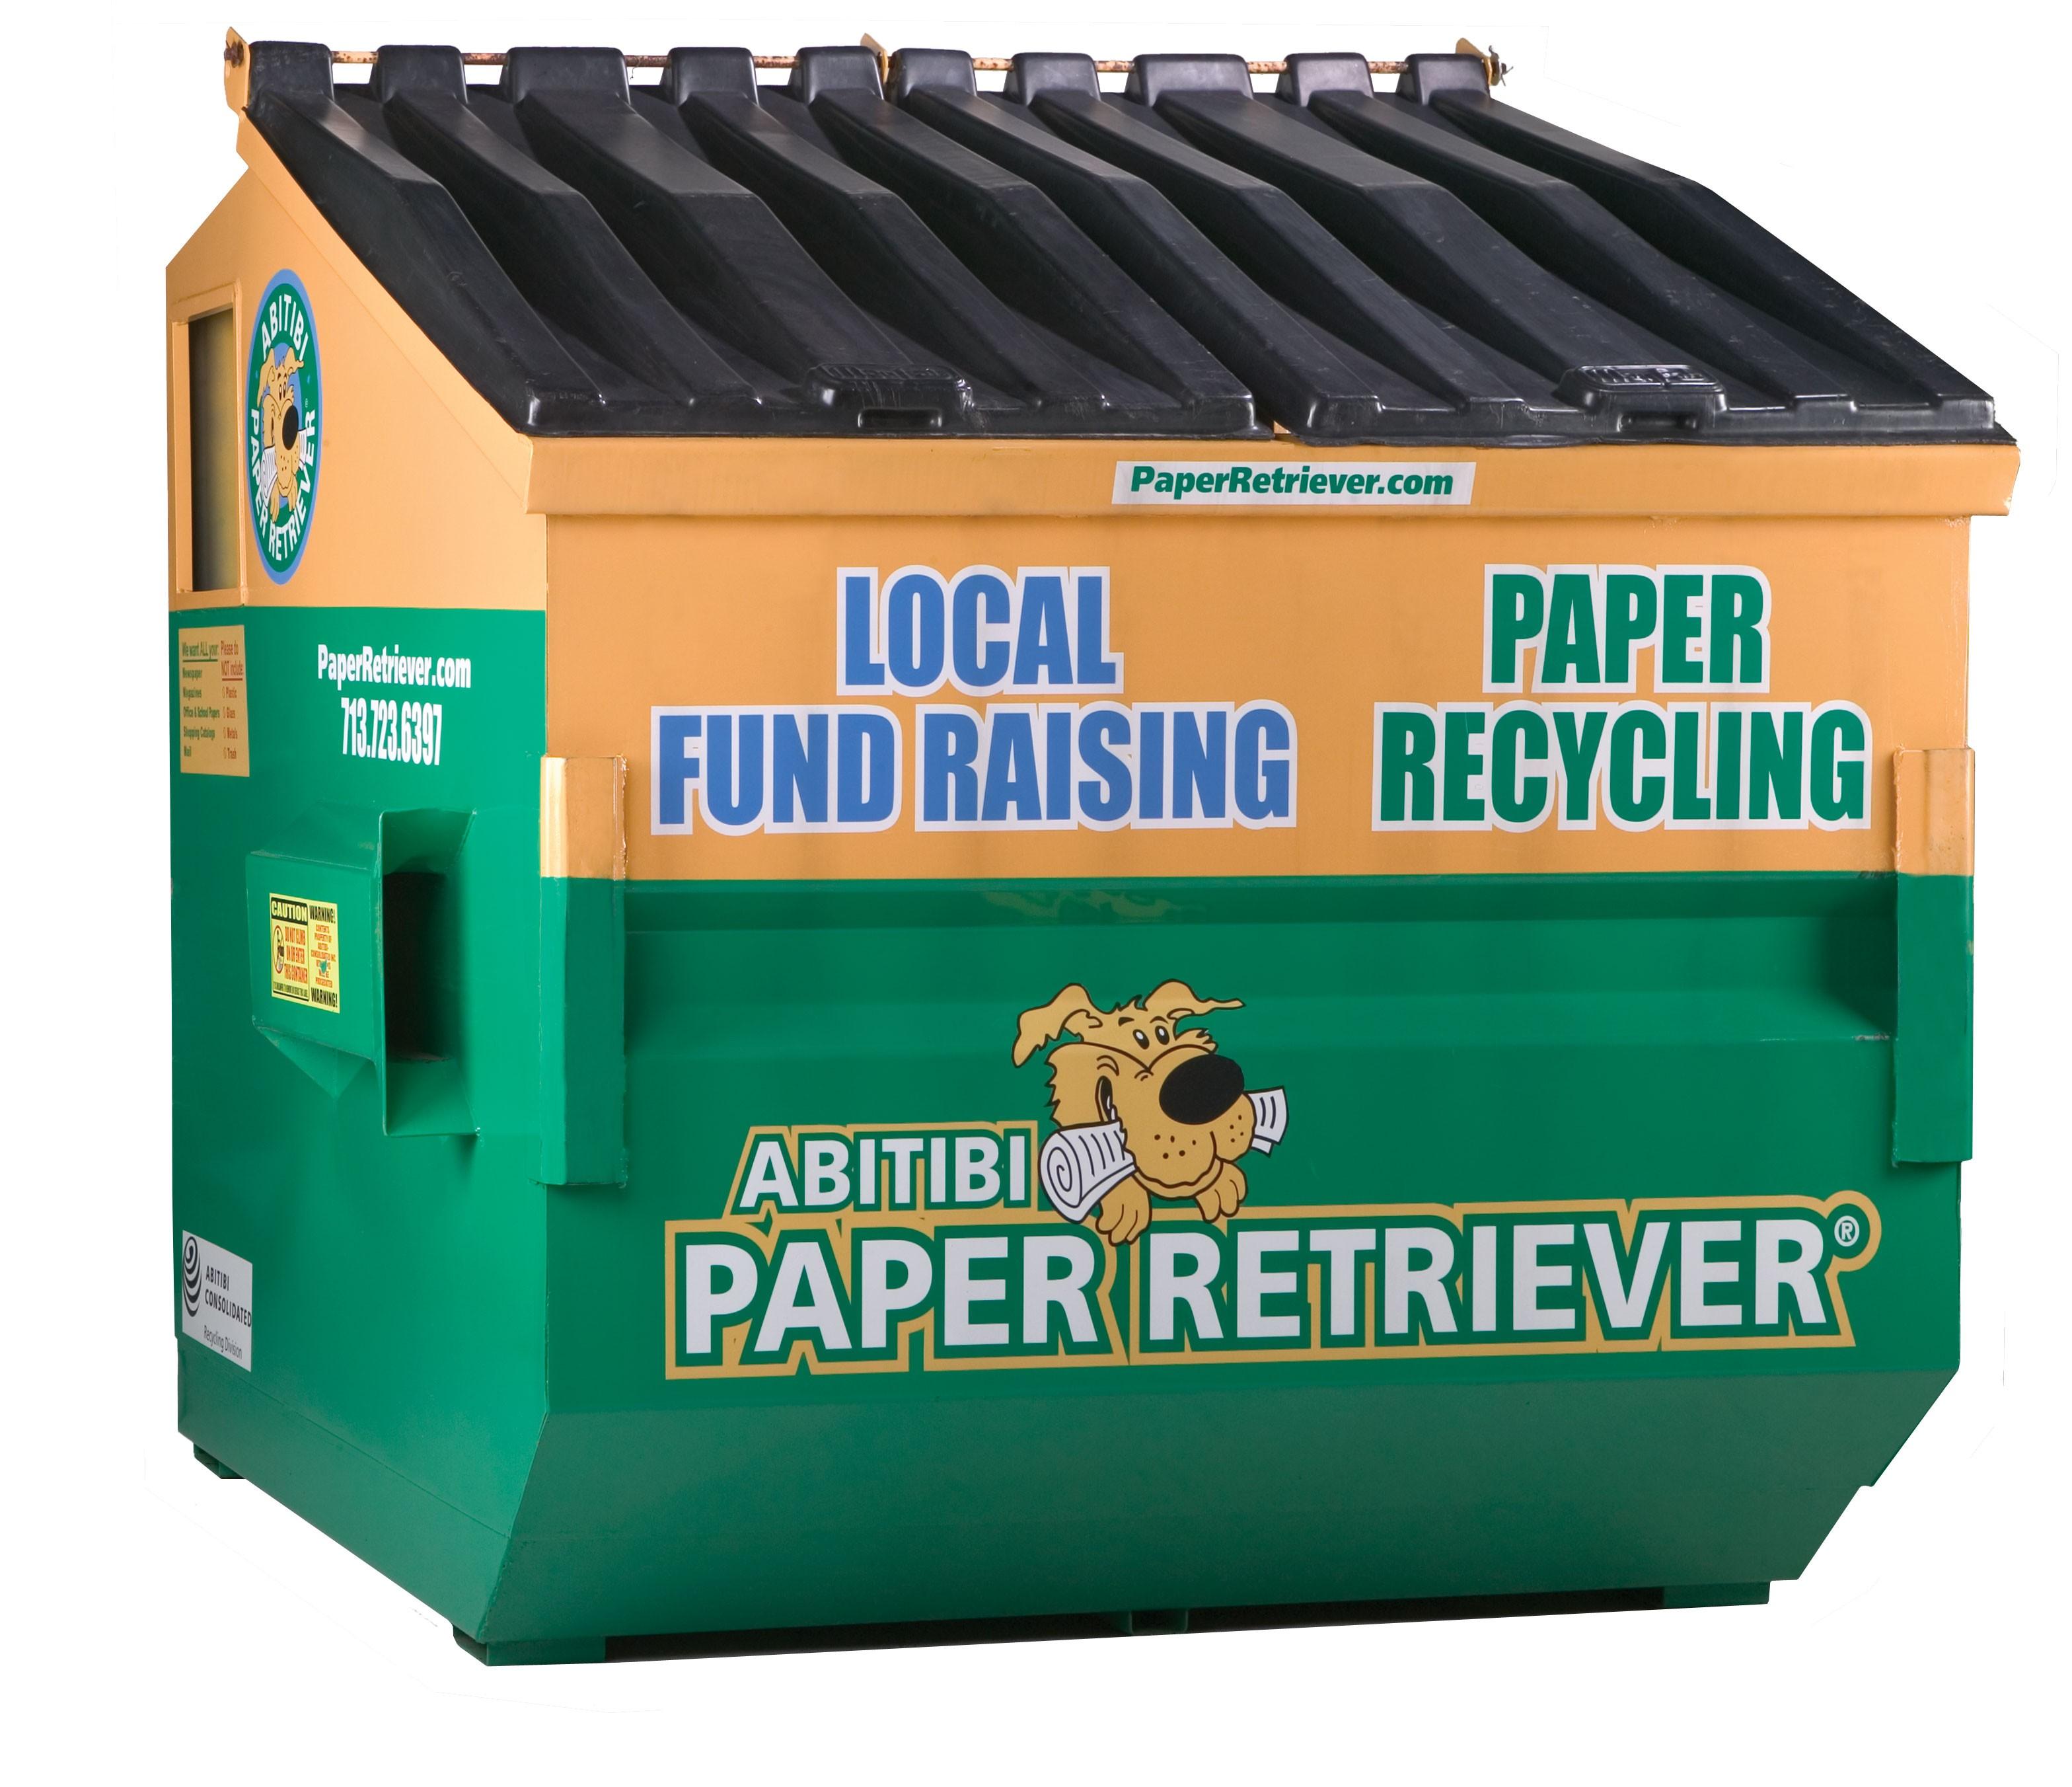 paper retriever bin